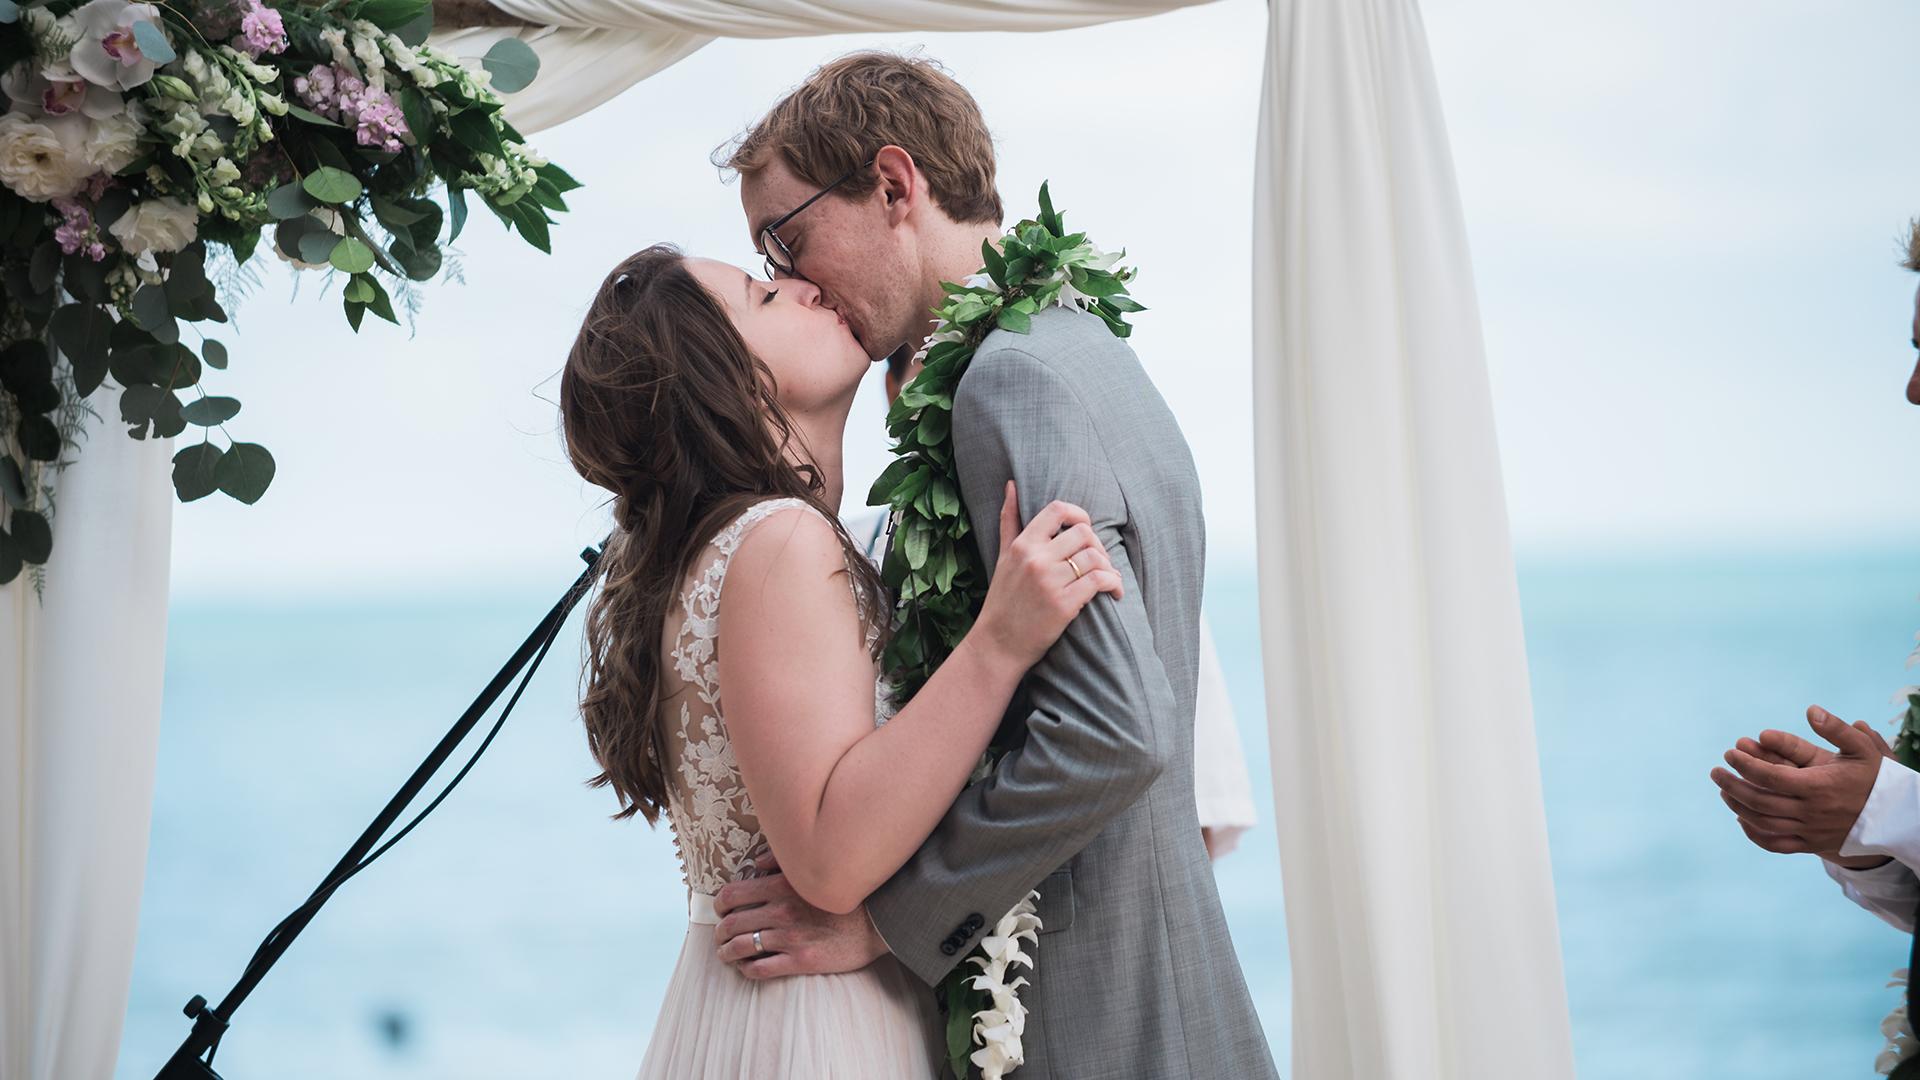 A destination wedding at Kualoa Ranch Secret Island, Hawaii.